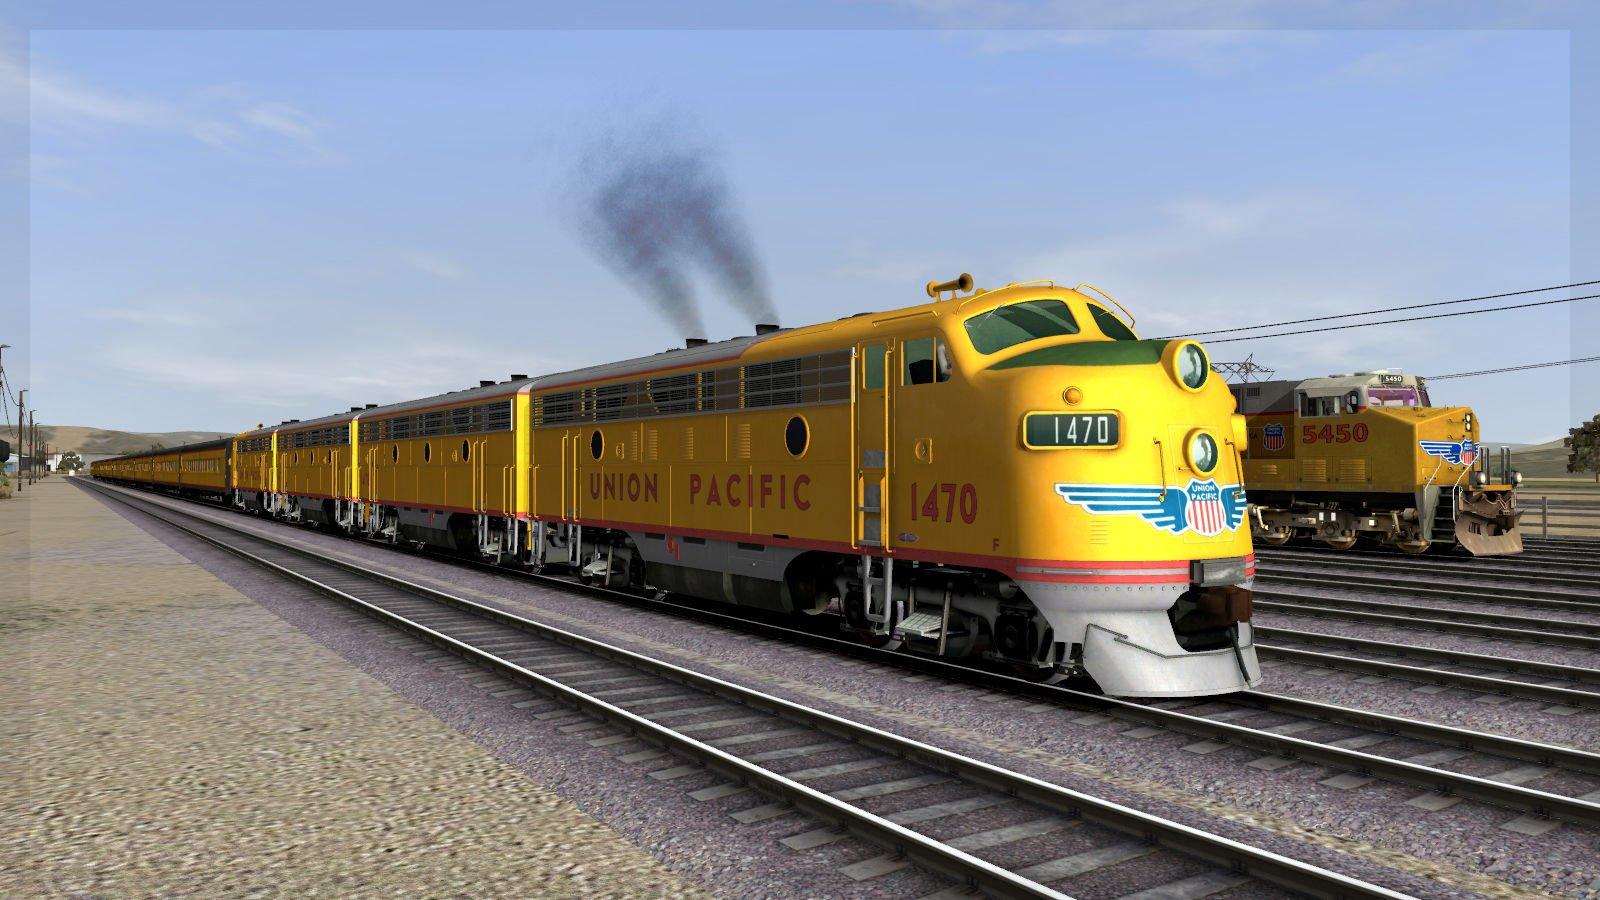 Train2go